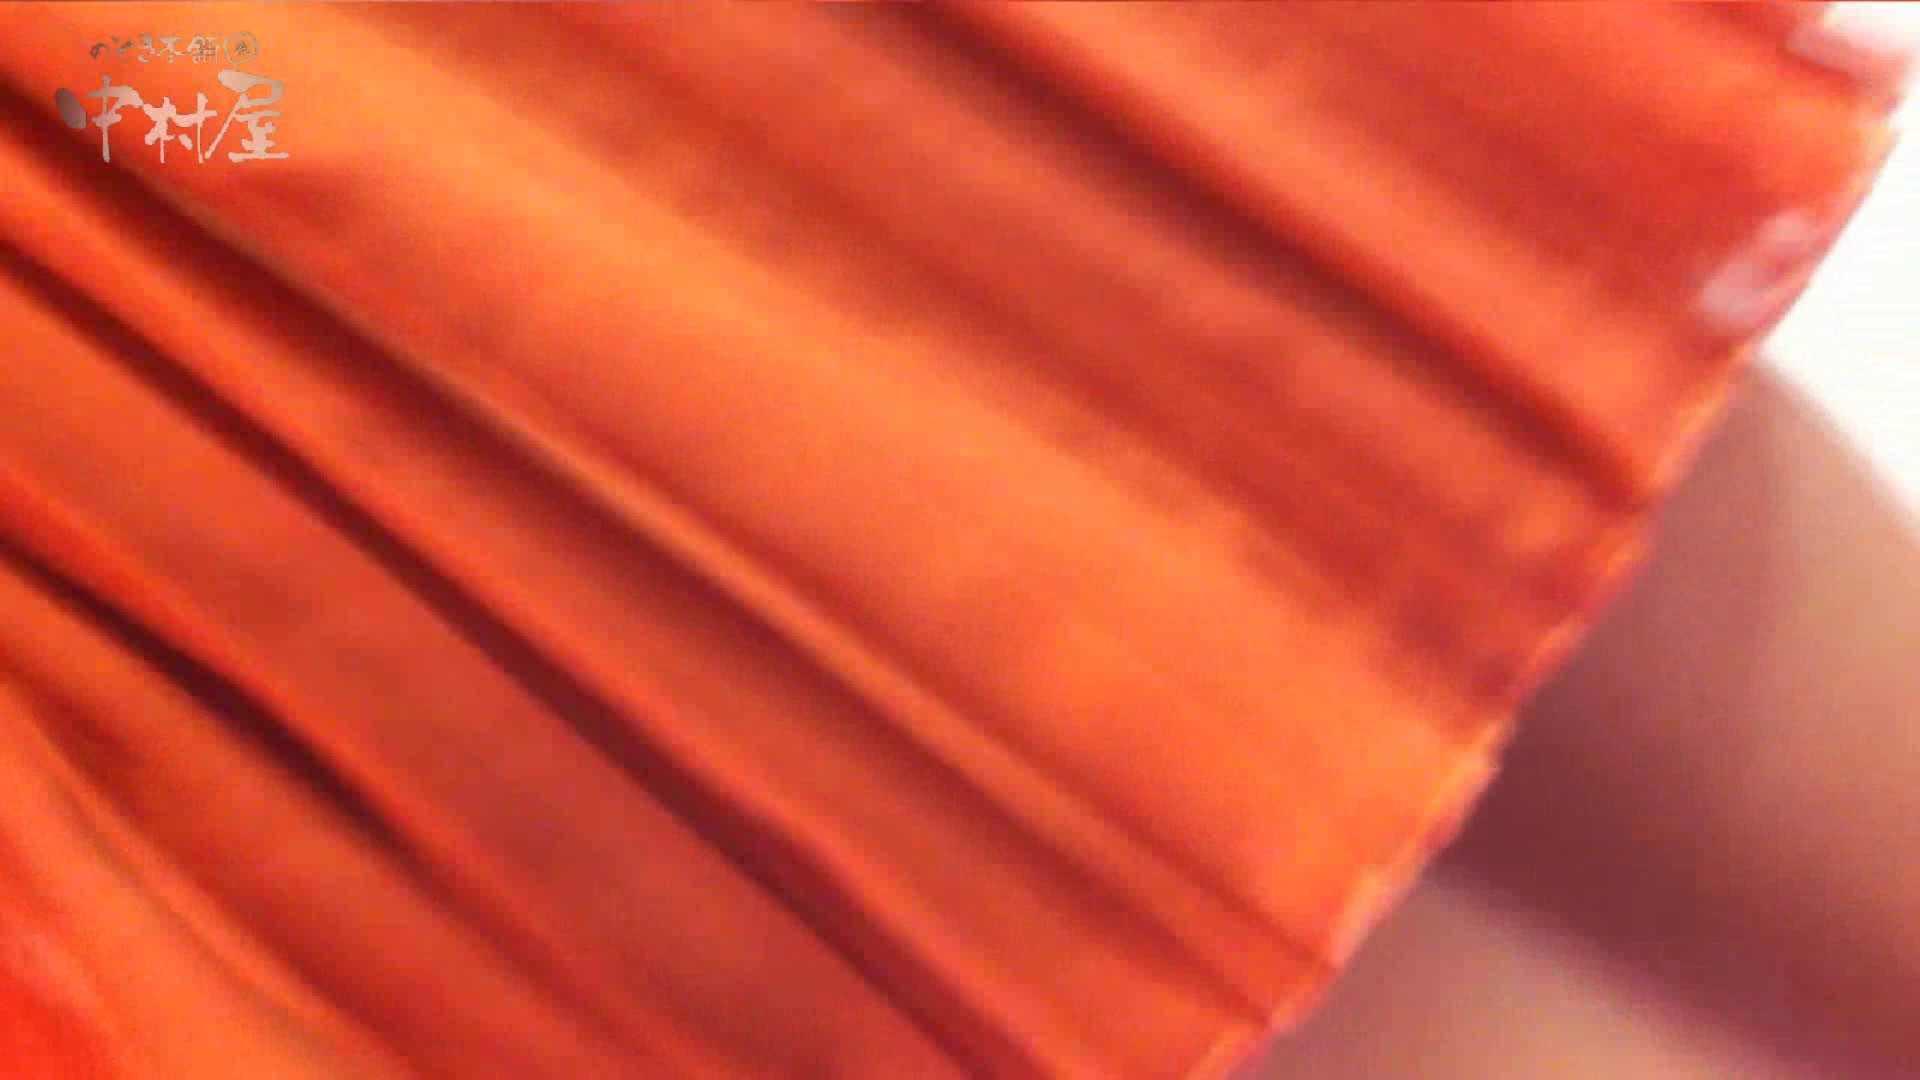 vol.70 美人アパレル胸チラ&パンチラ ベレー店員さんの下着 OLエロ画像 盗撮われめAV動画紹介 90PICs 26